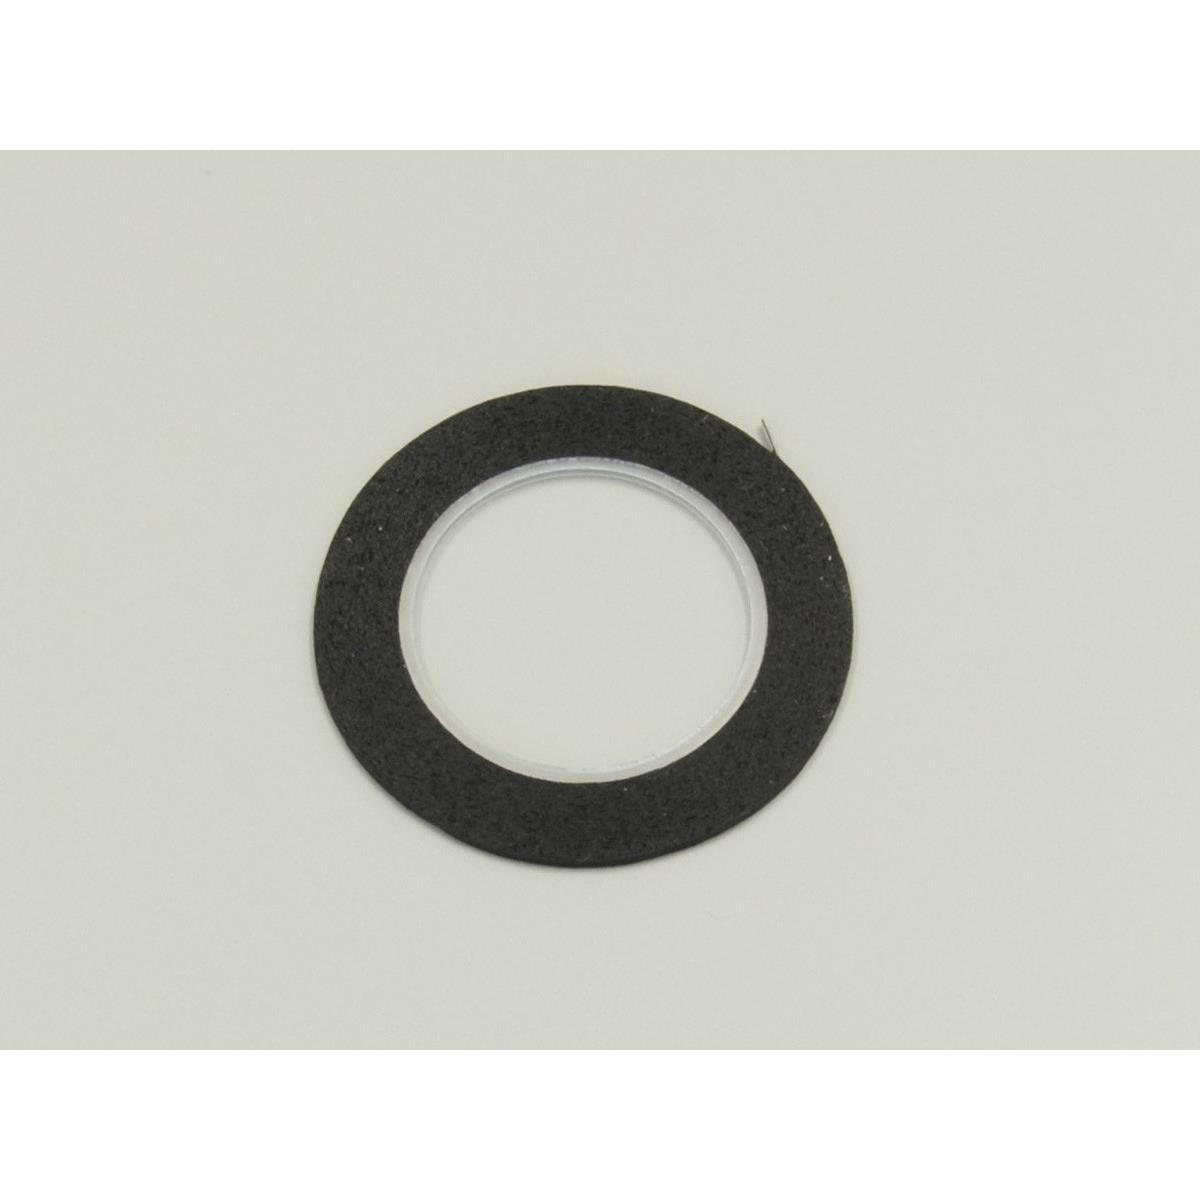 1843BK Micron Tape  2.5mm x 5m  Black